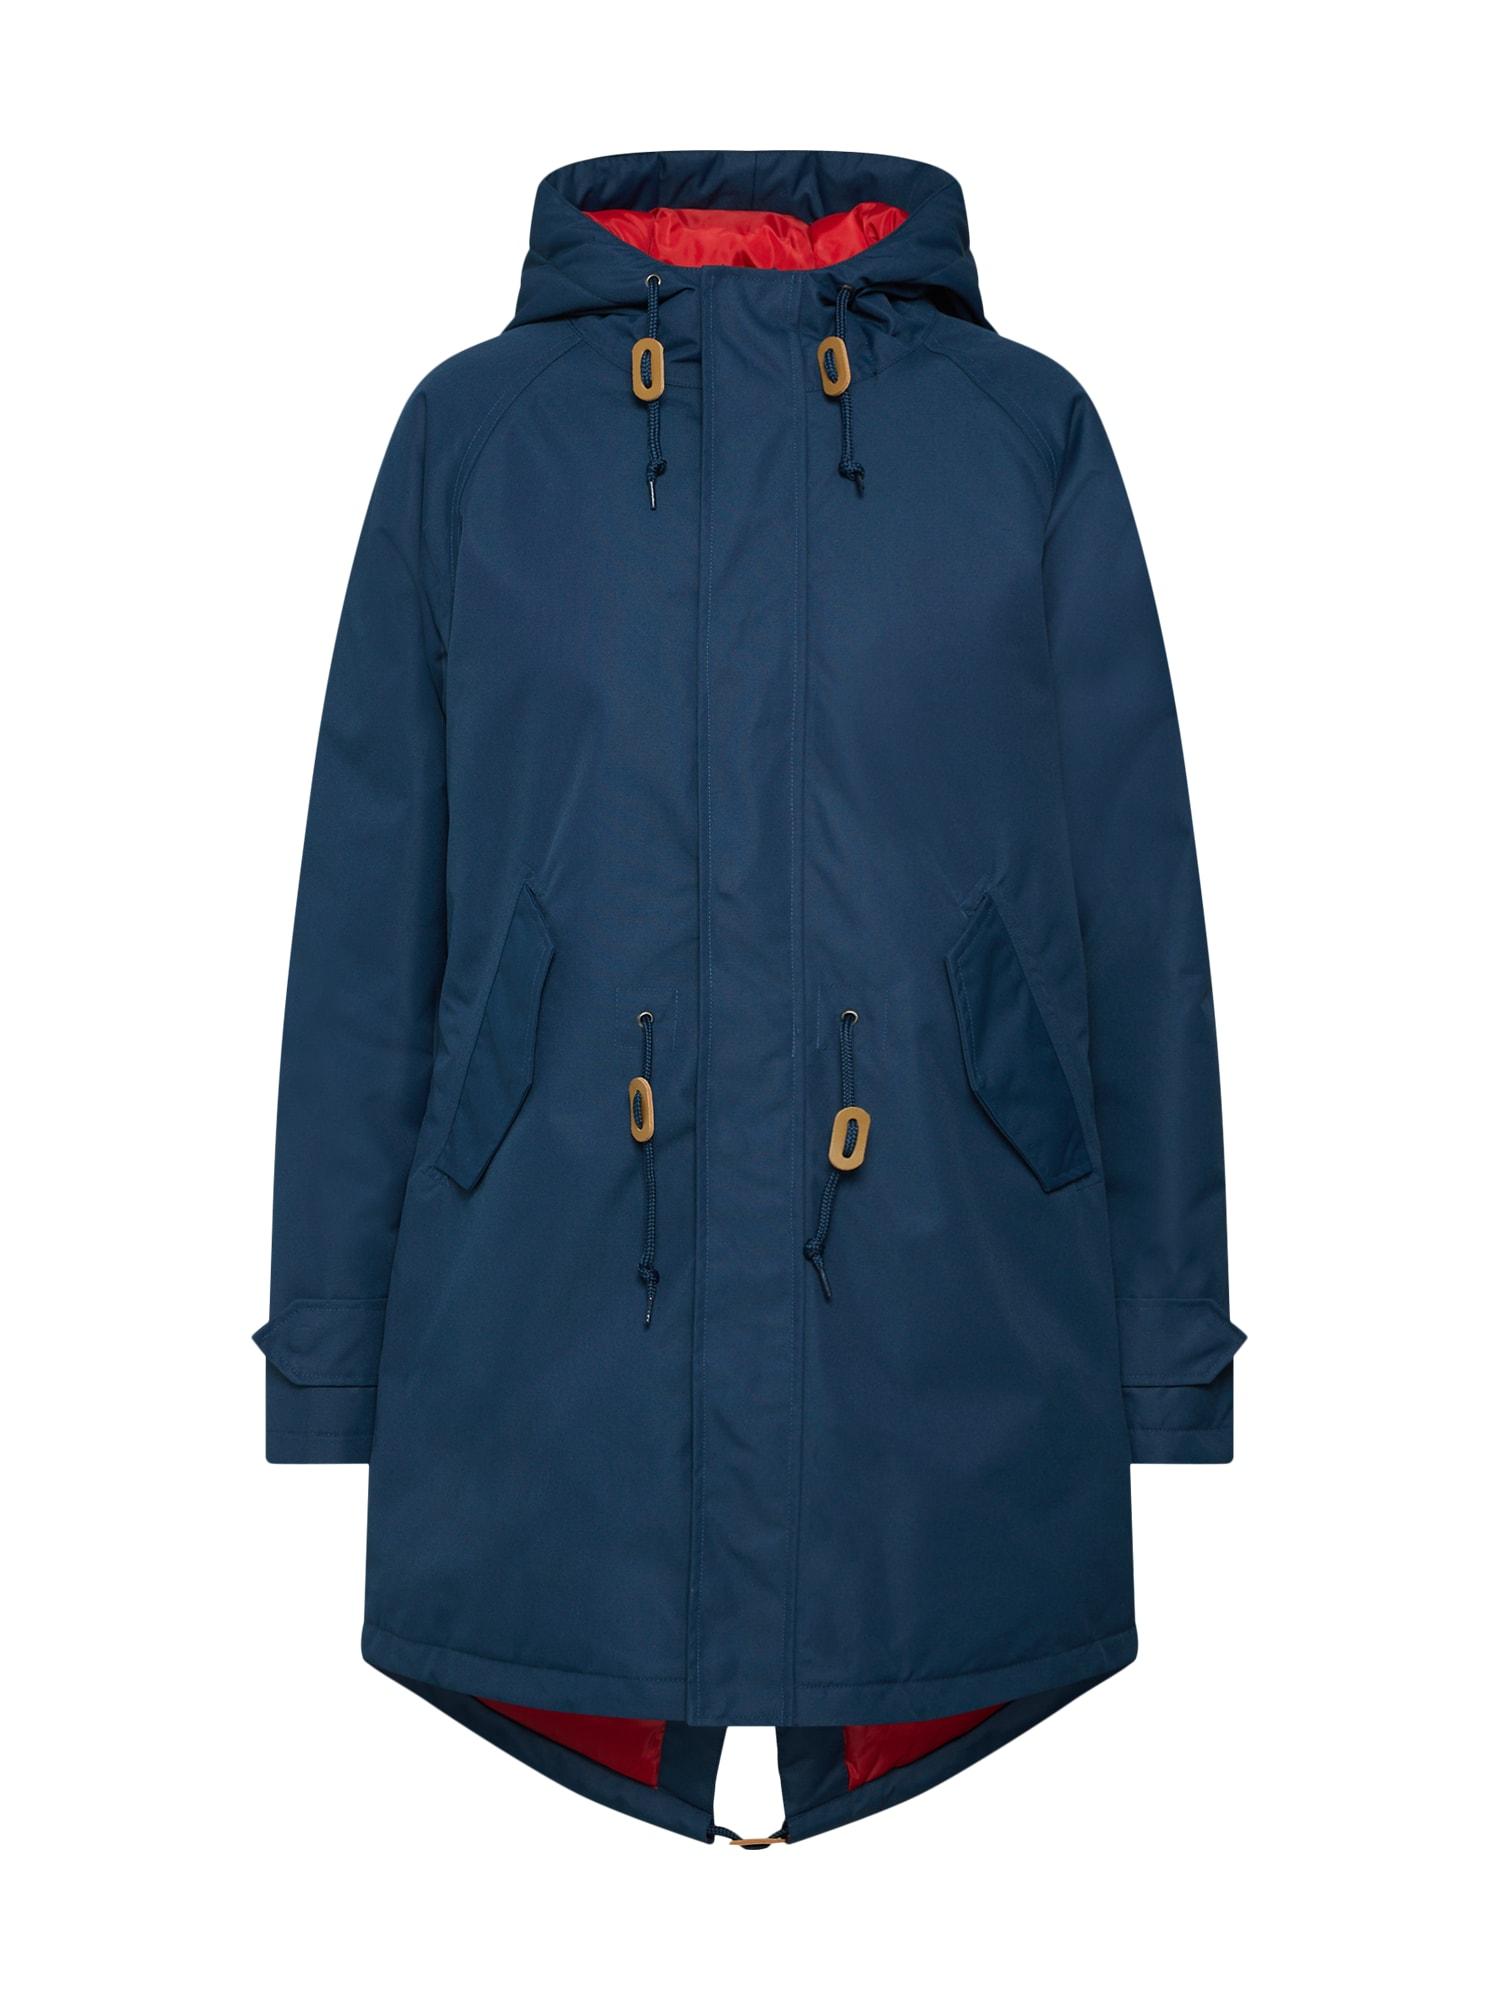 Zimní kabát Watt´n Winter námořnická modř Derbe